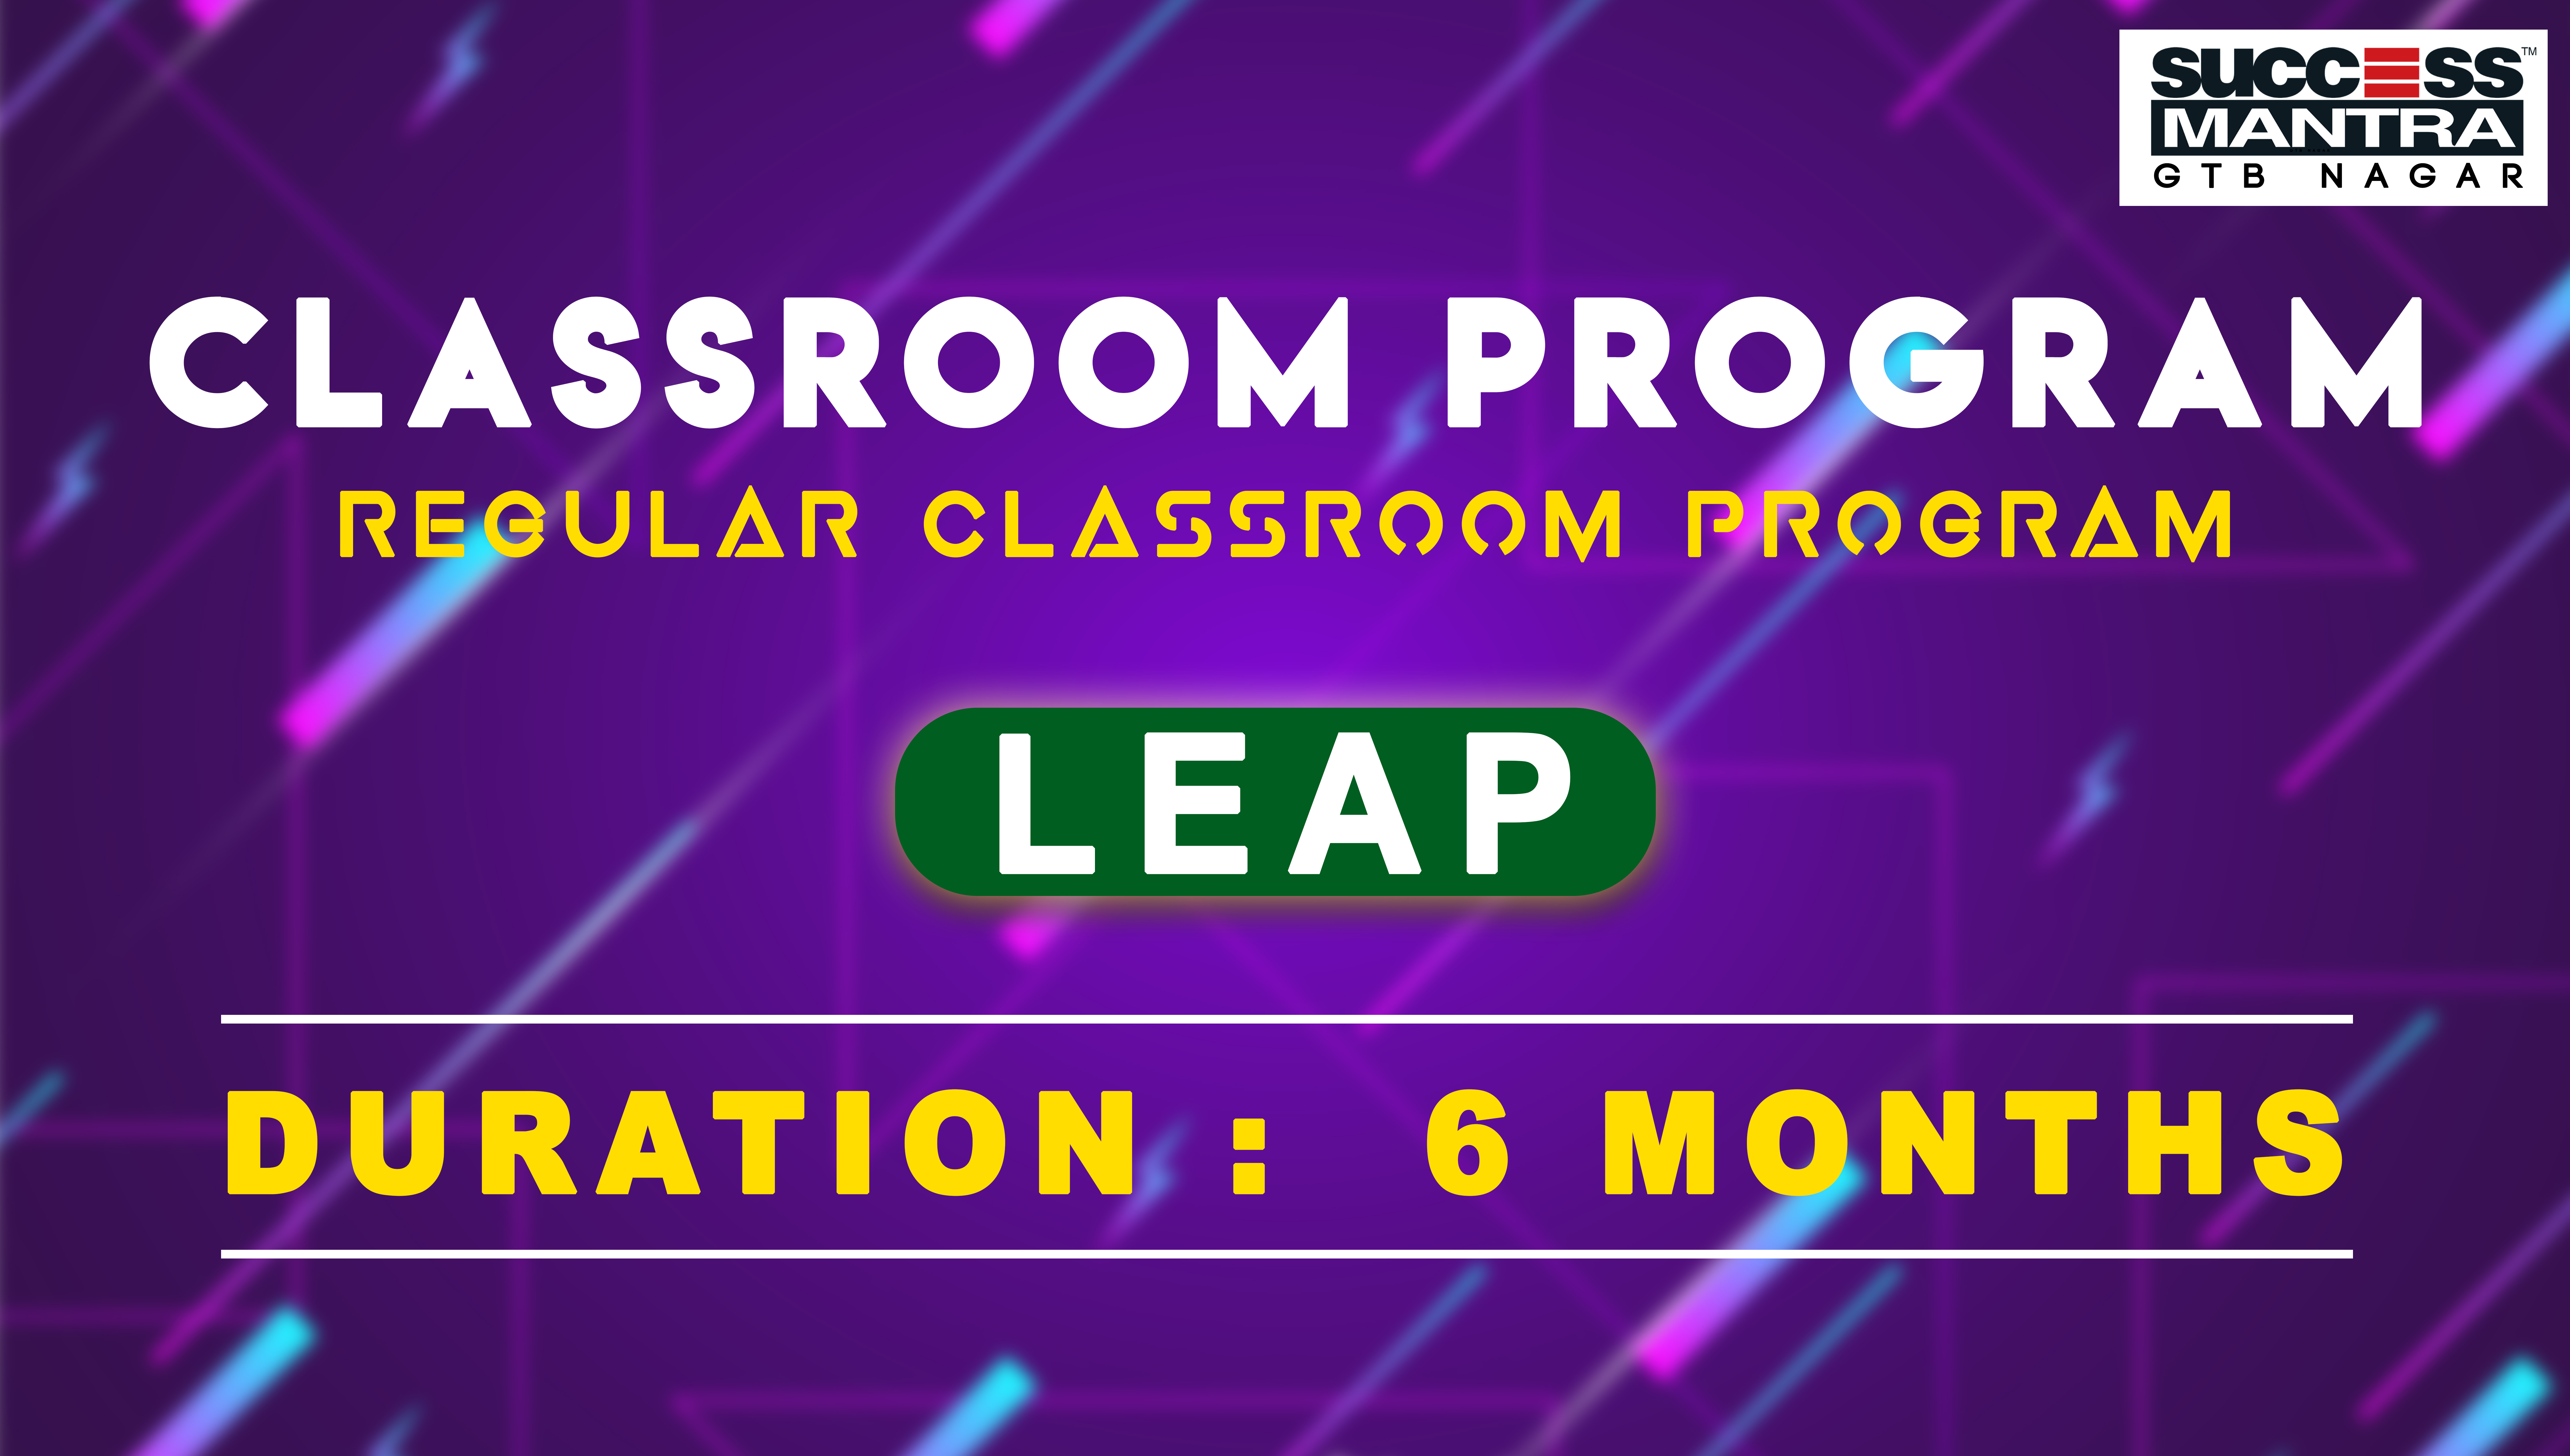 CLAT Classroom Coaching Program | LEAP Short term course (Six months) at Success Mantra | Success Mantra Coaching G.T.B Nagar